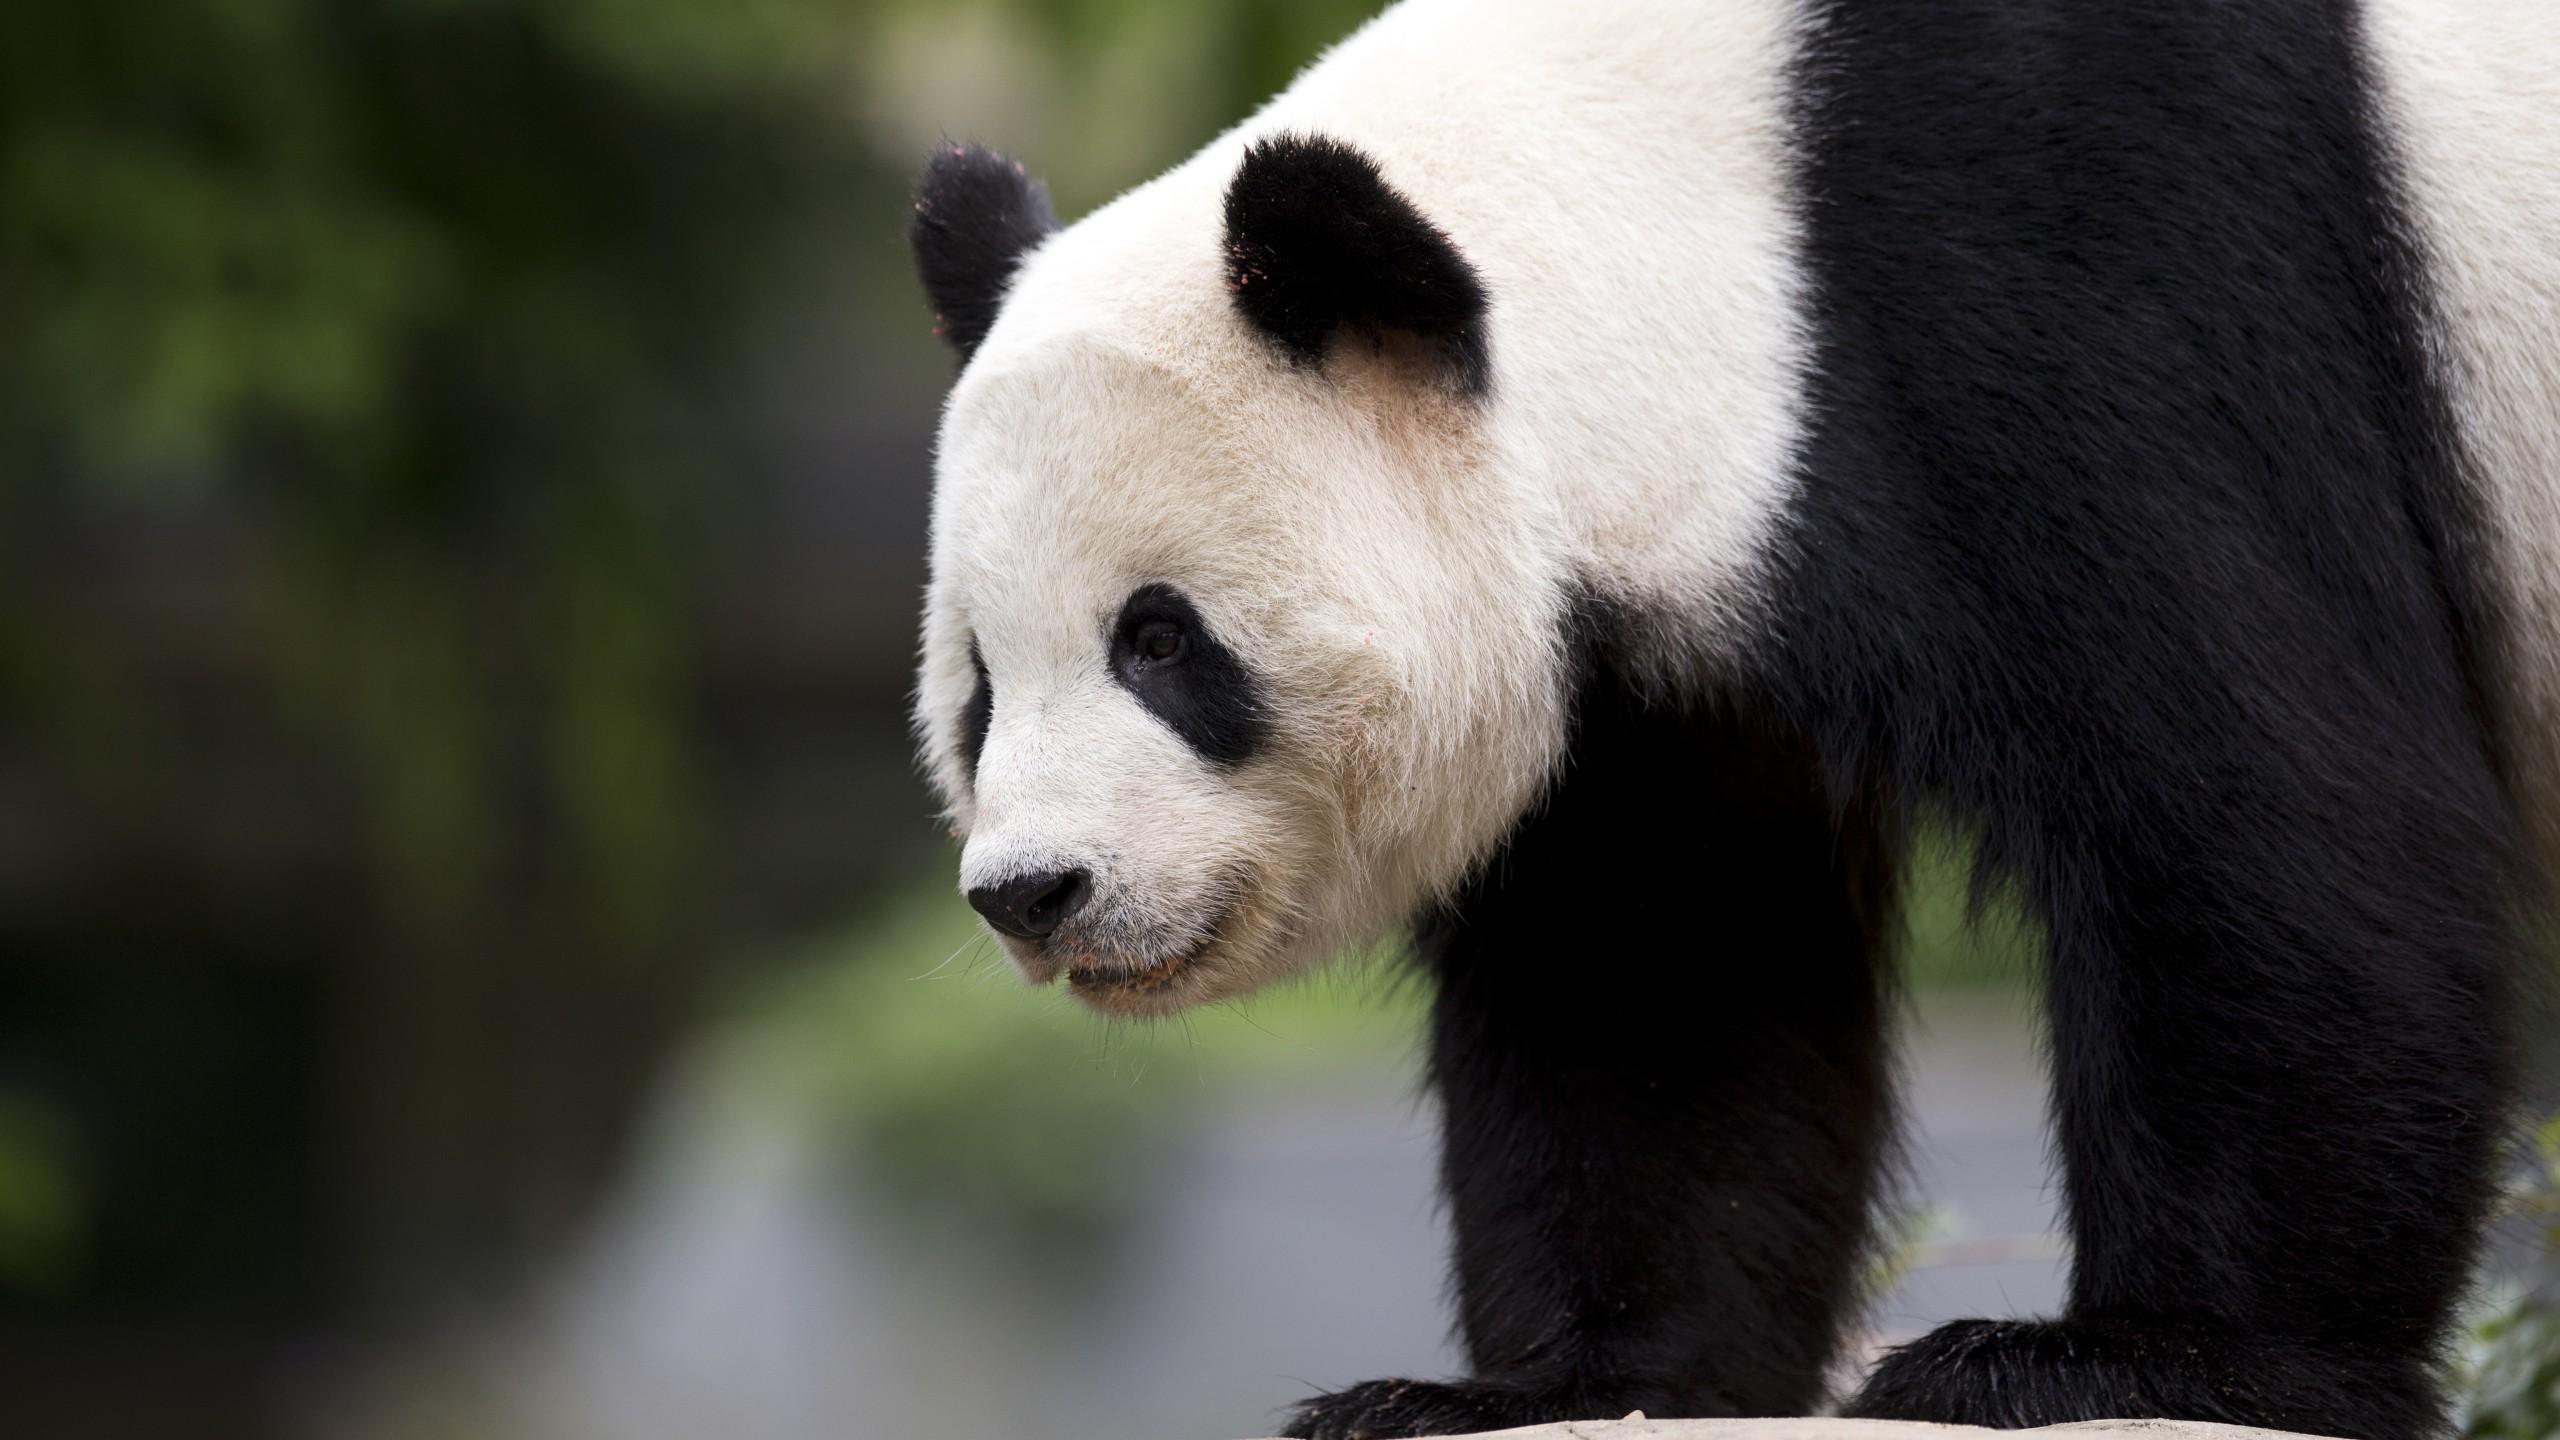 Wallpaper panda, cute animals, 6k, Animals #14879